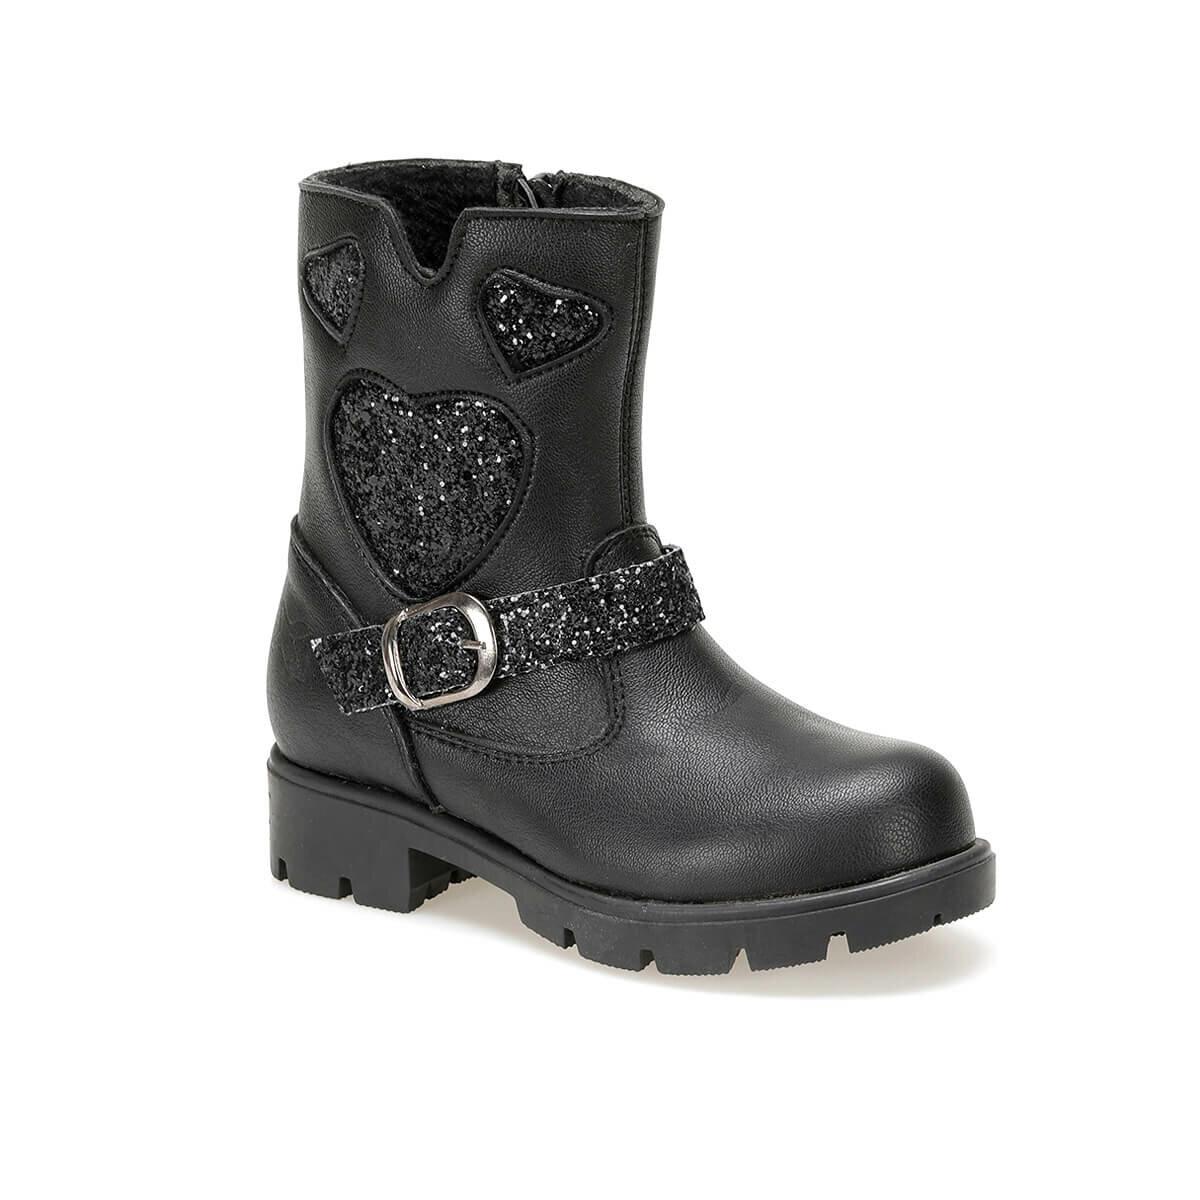 FLO RIMMA 9PR Black Female Child Basic Casual Shoes KINETIX